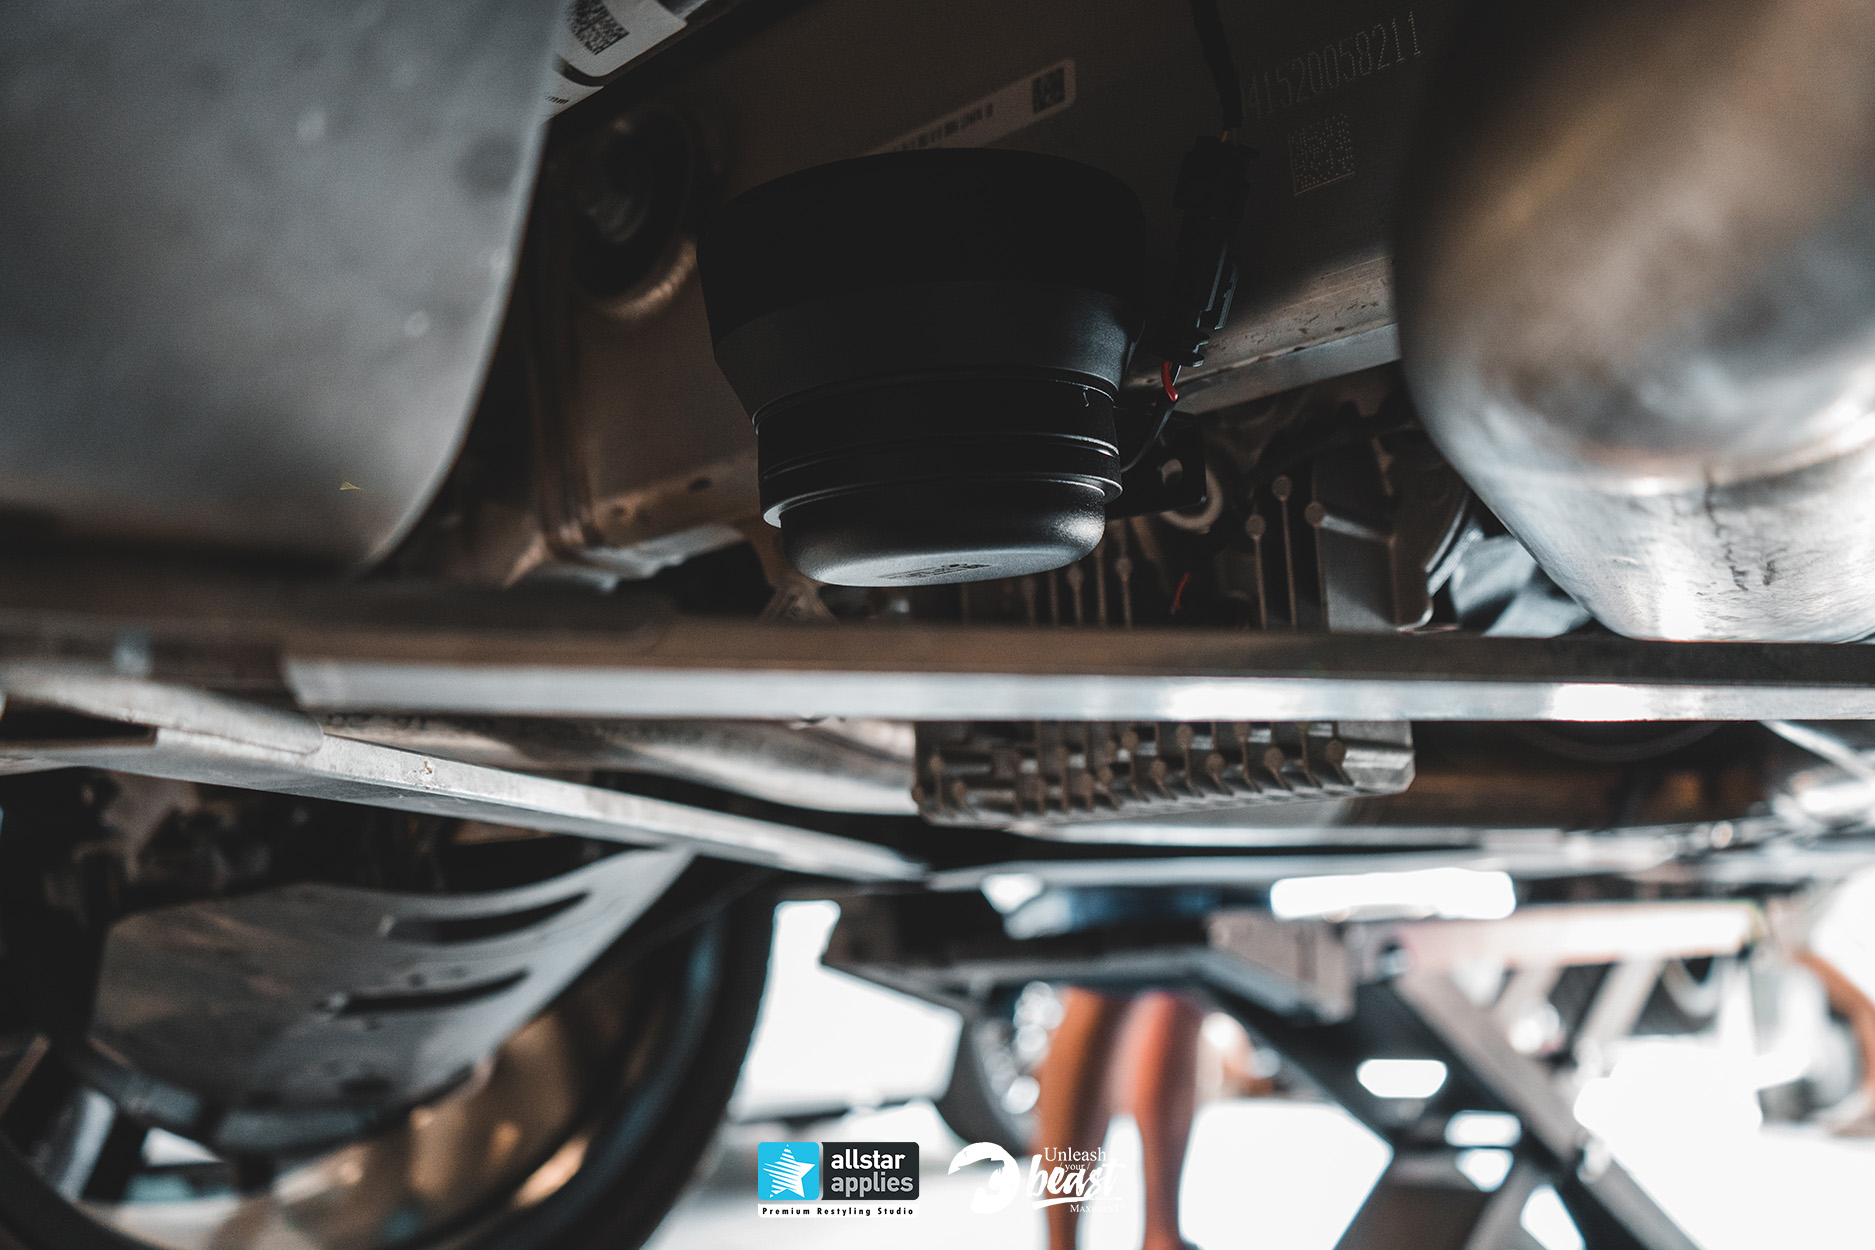 MAXHAUST BMW X6 M50D 2021 5